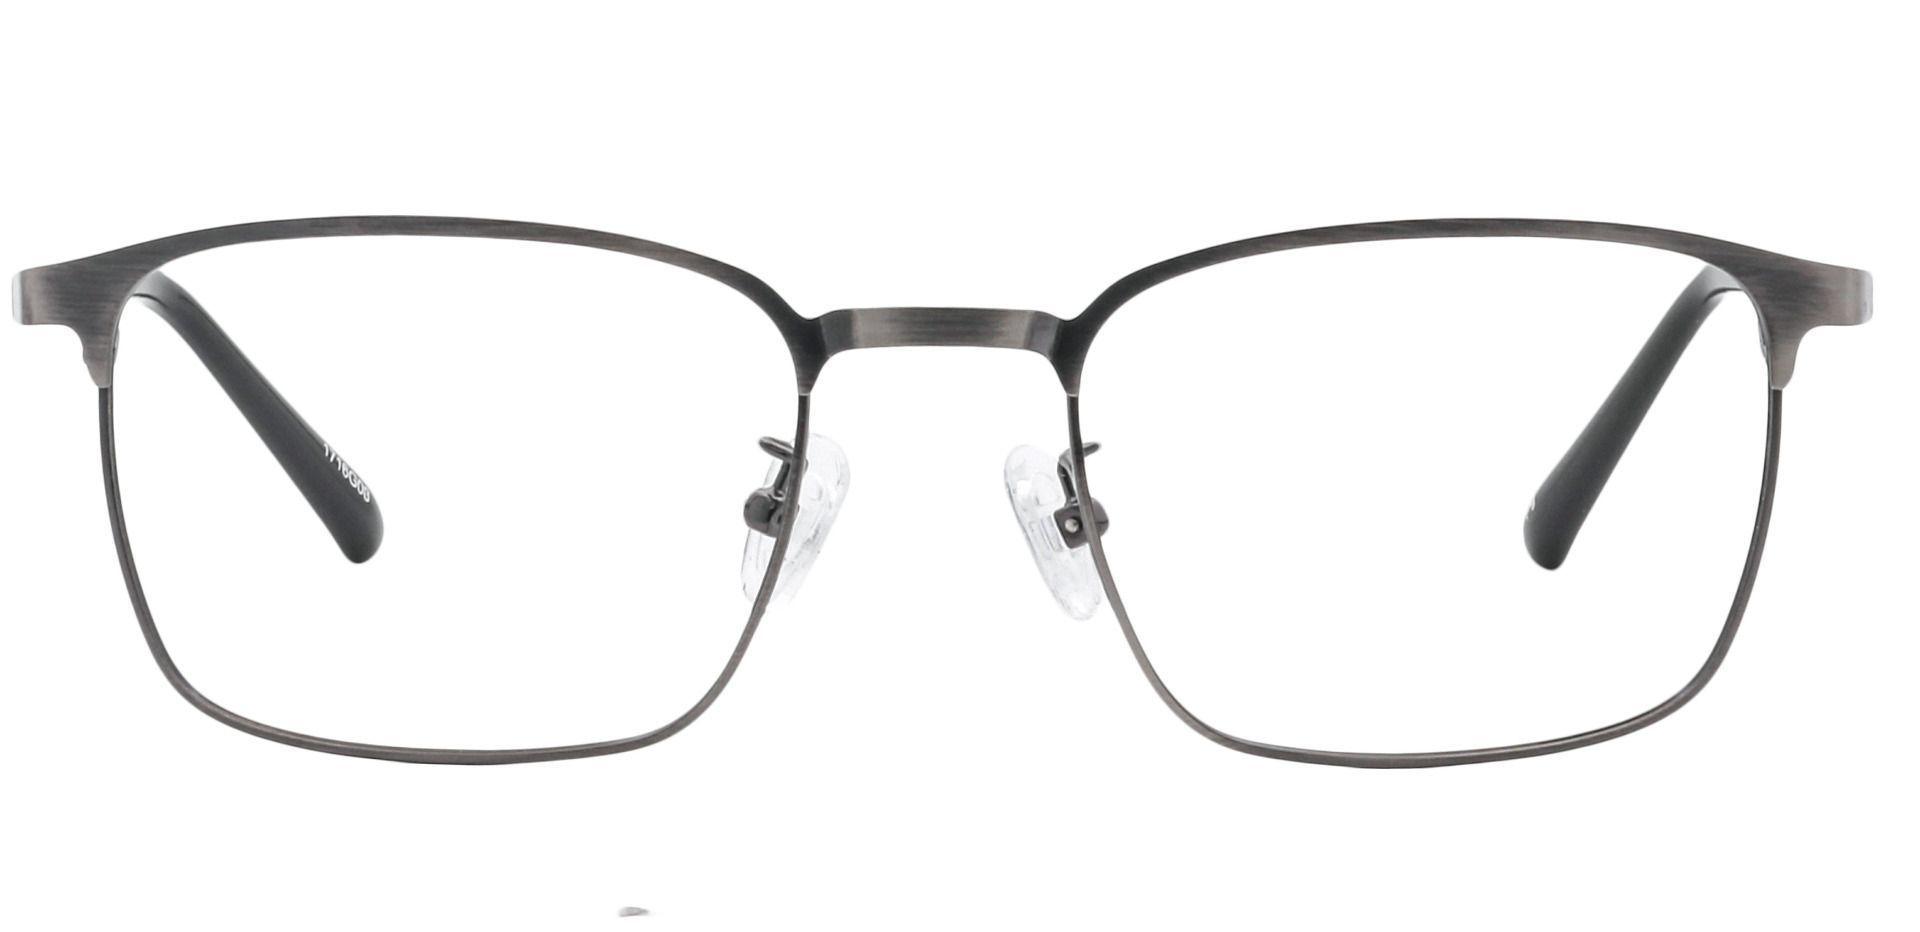 Kingston Square Prescription Glasses - Gray